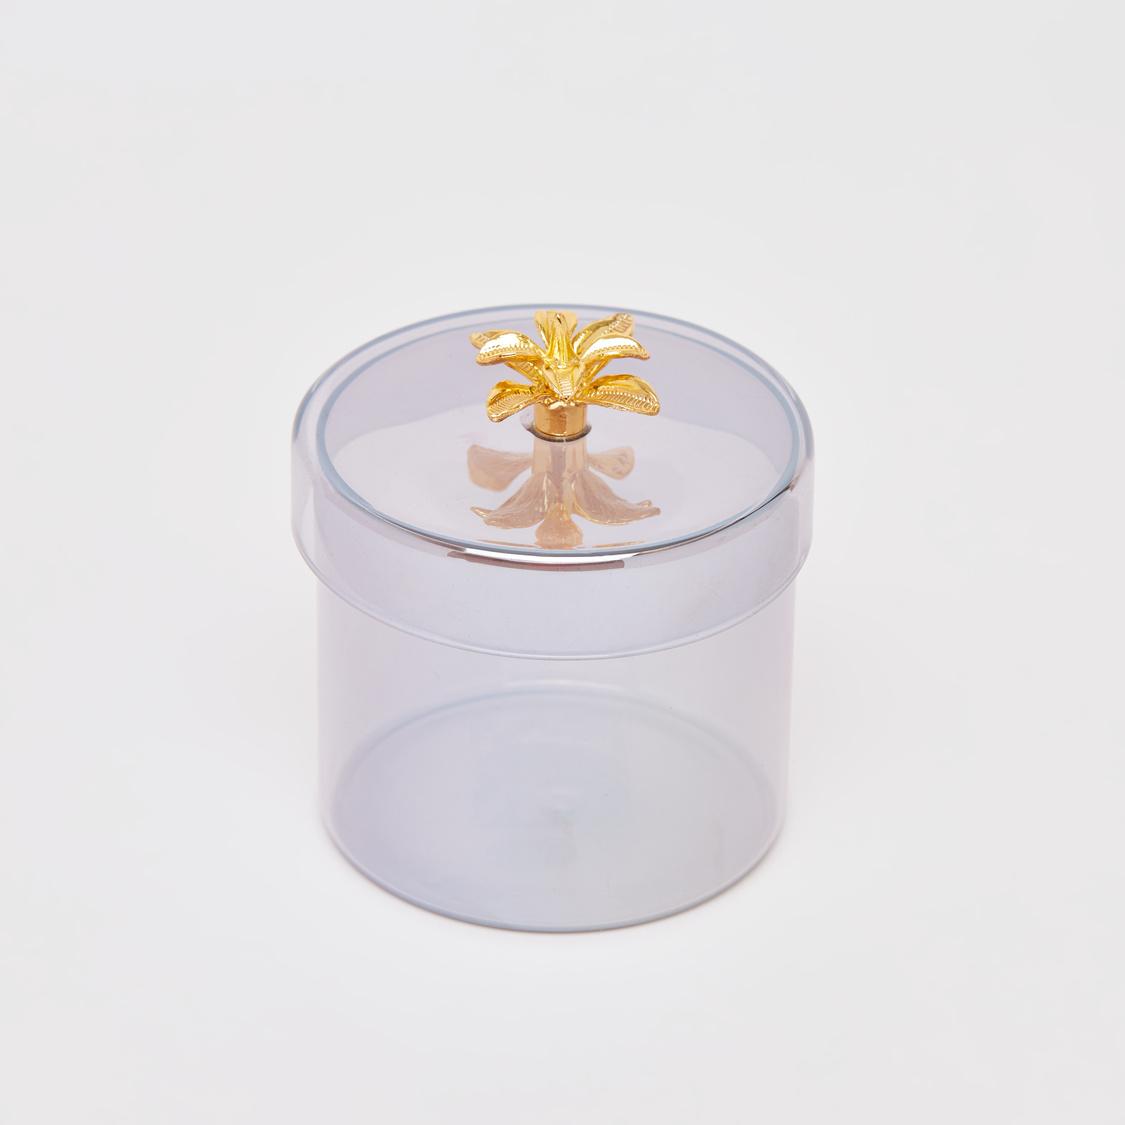 Glass Jewellery Box with Lid - 9.5x10 cms